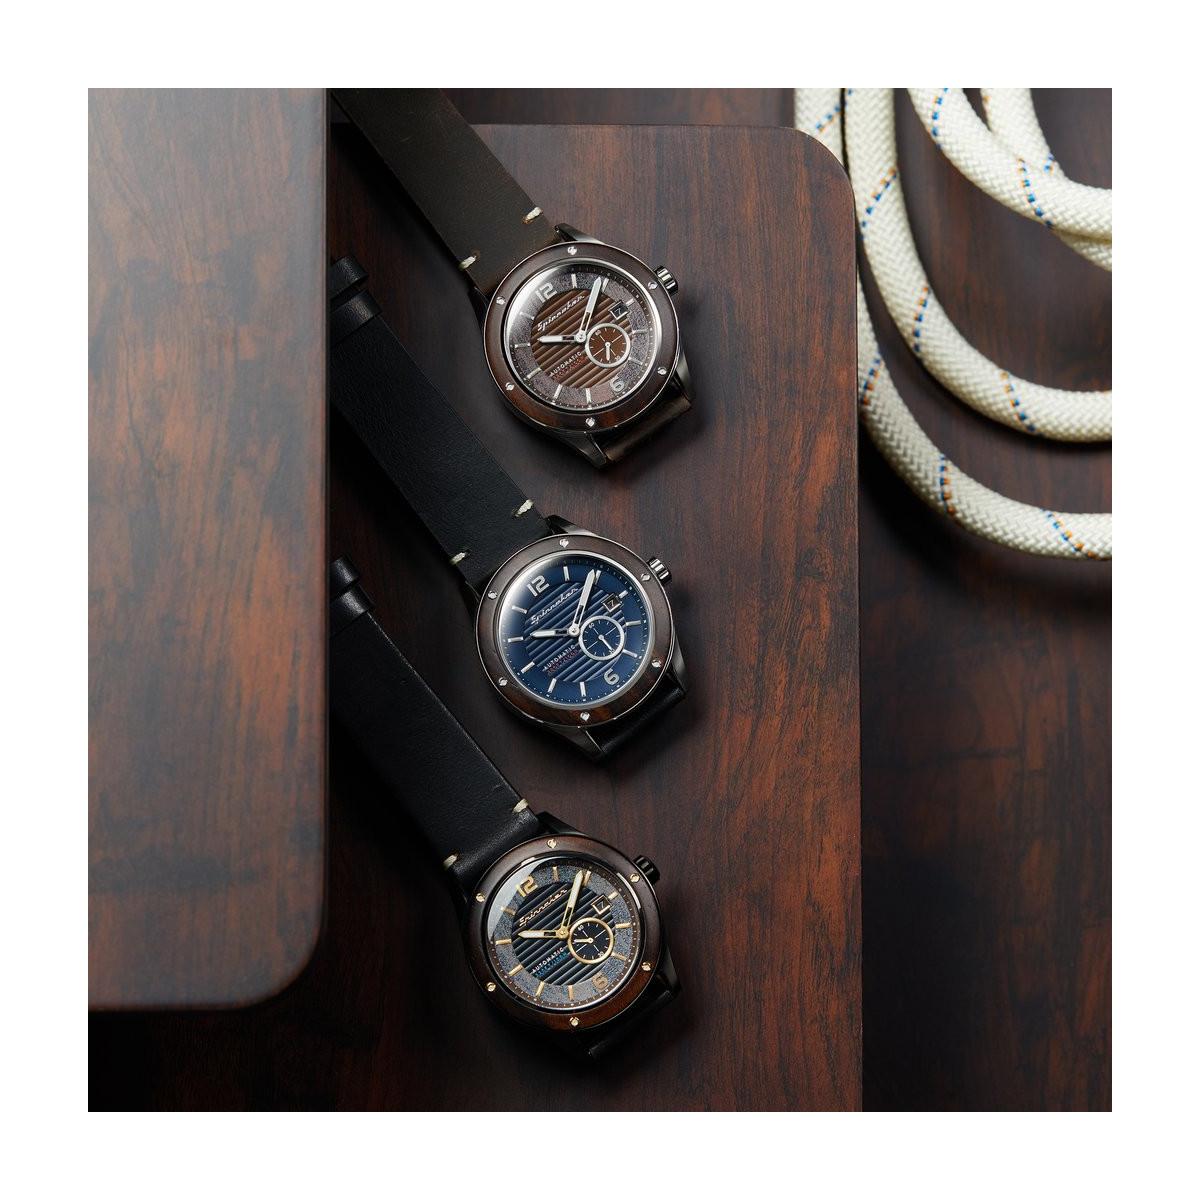 Montre Spinnaker Sorrento  Automatique Cadran bleu - SP-5067-02